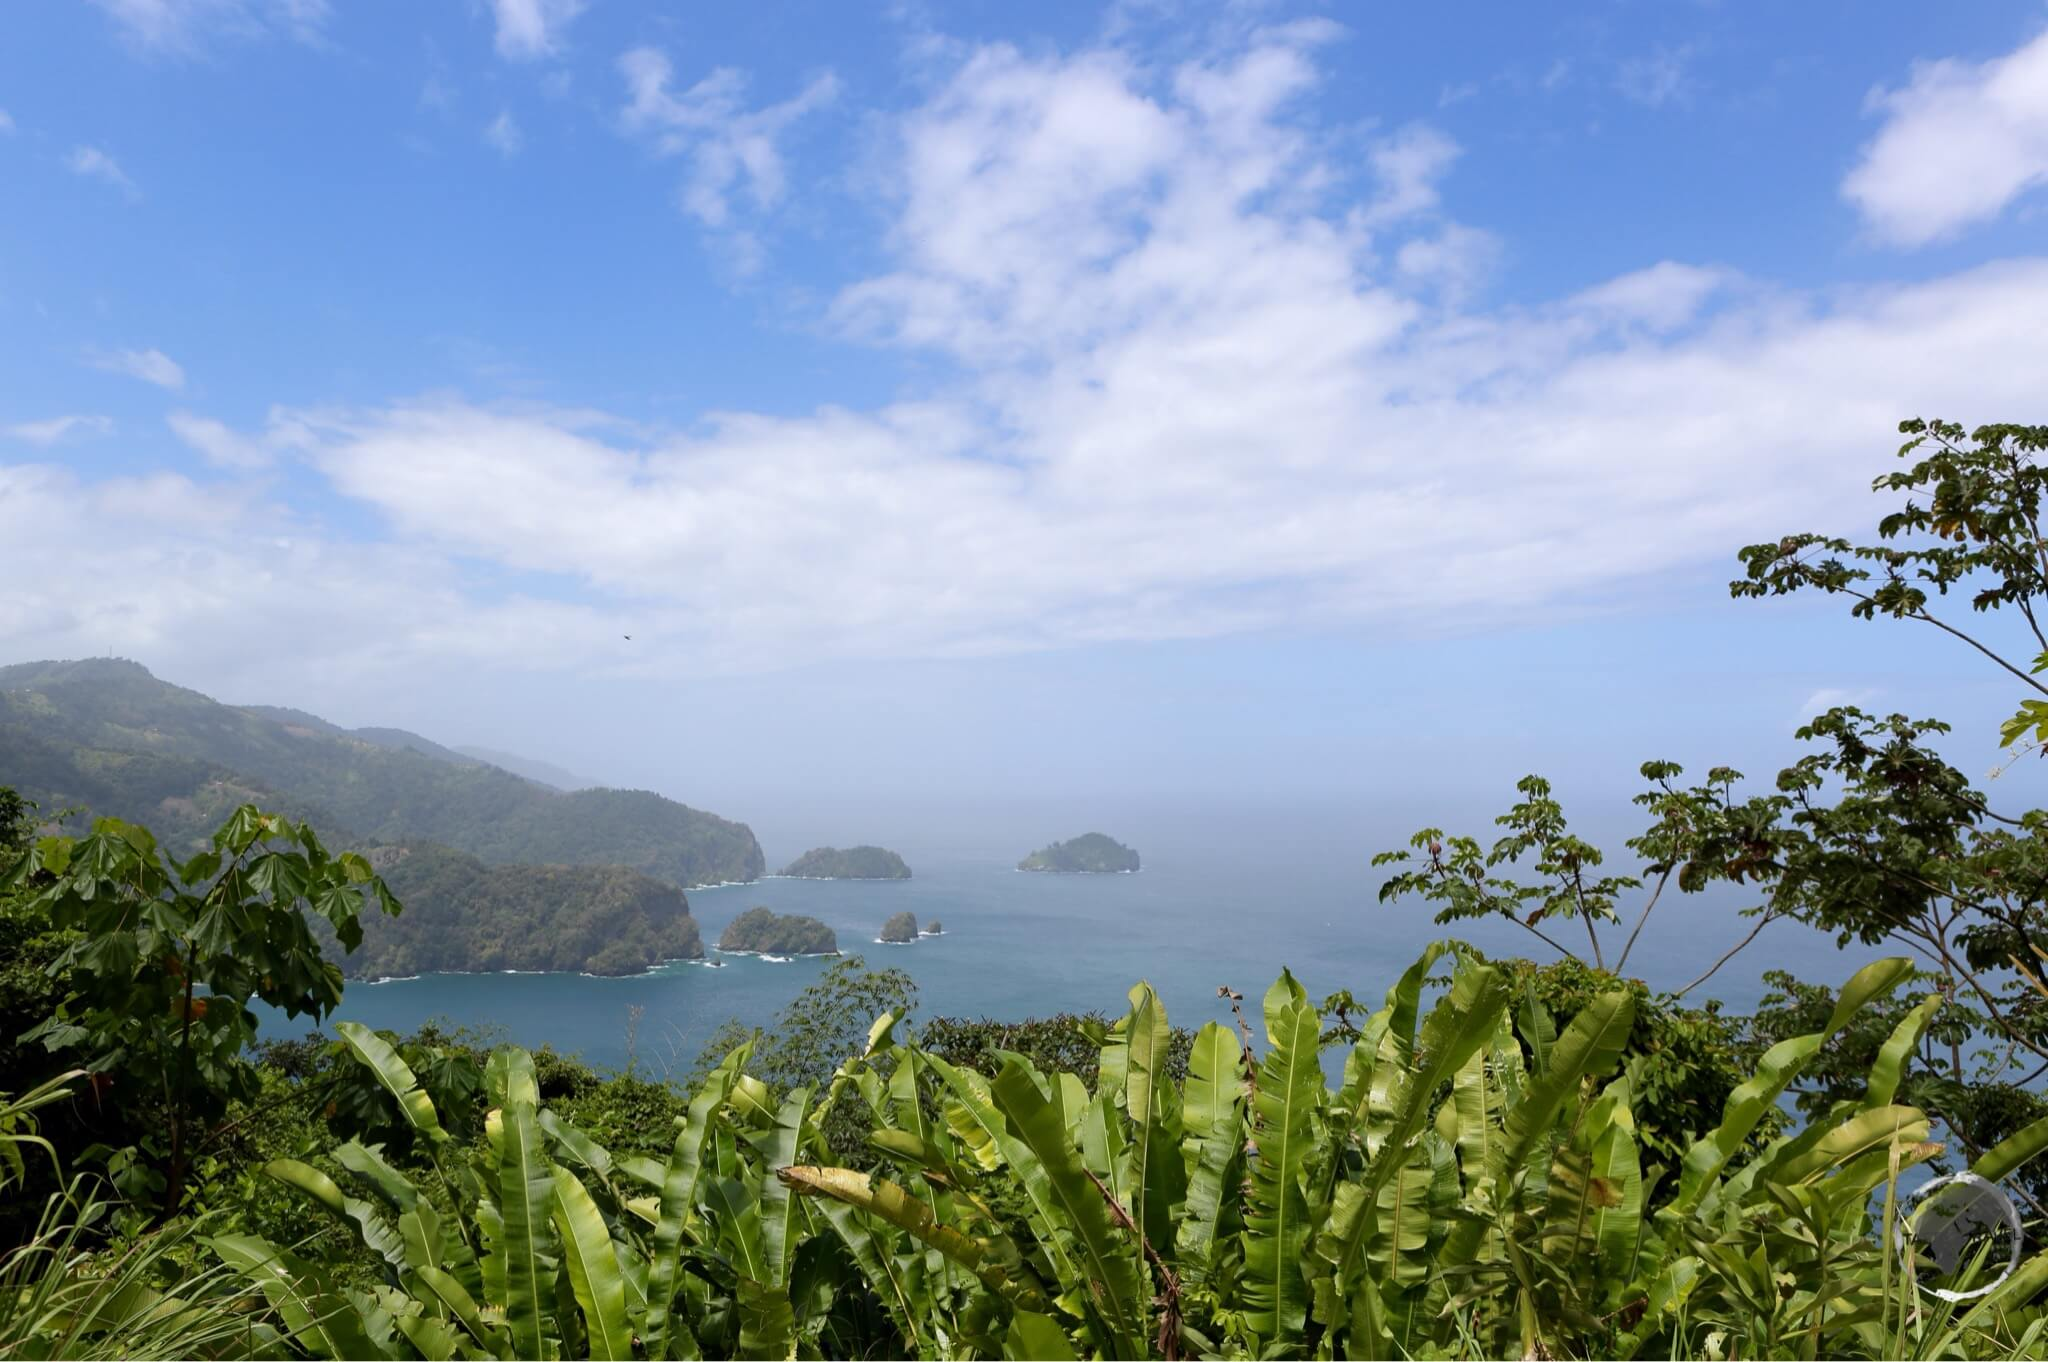 North coast of Trinidad from Maracas lookout.